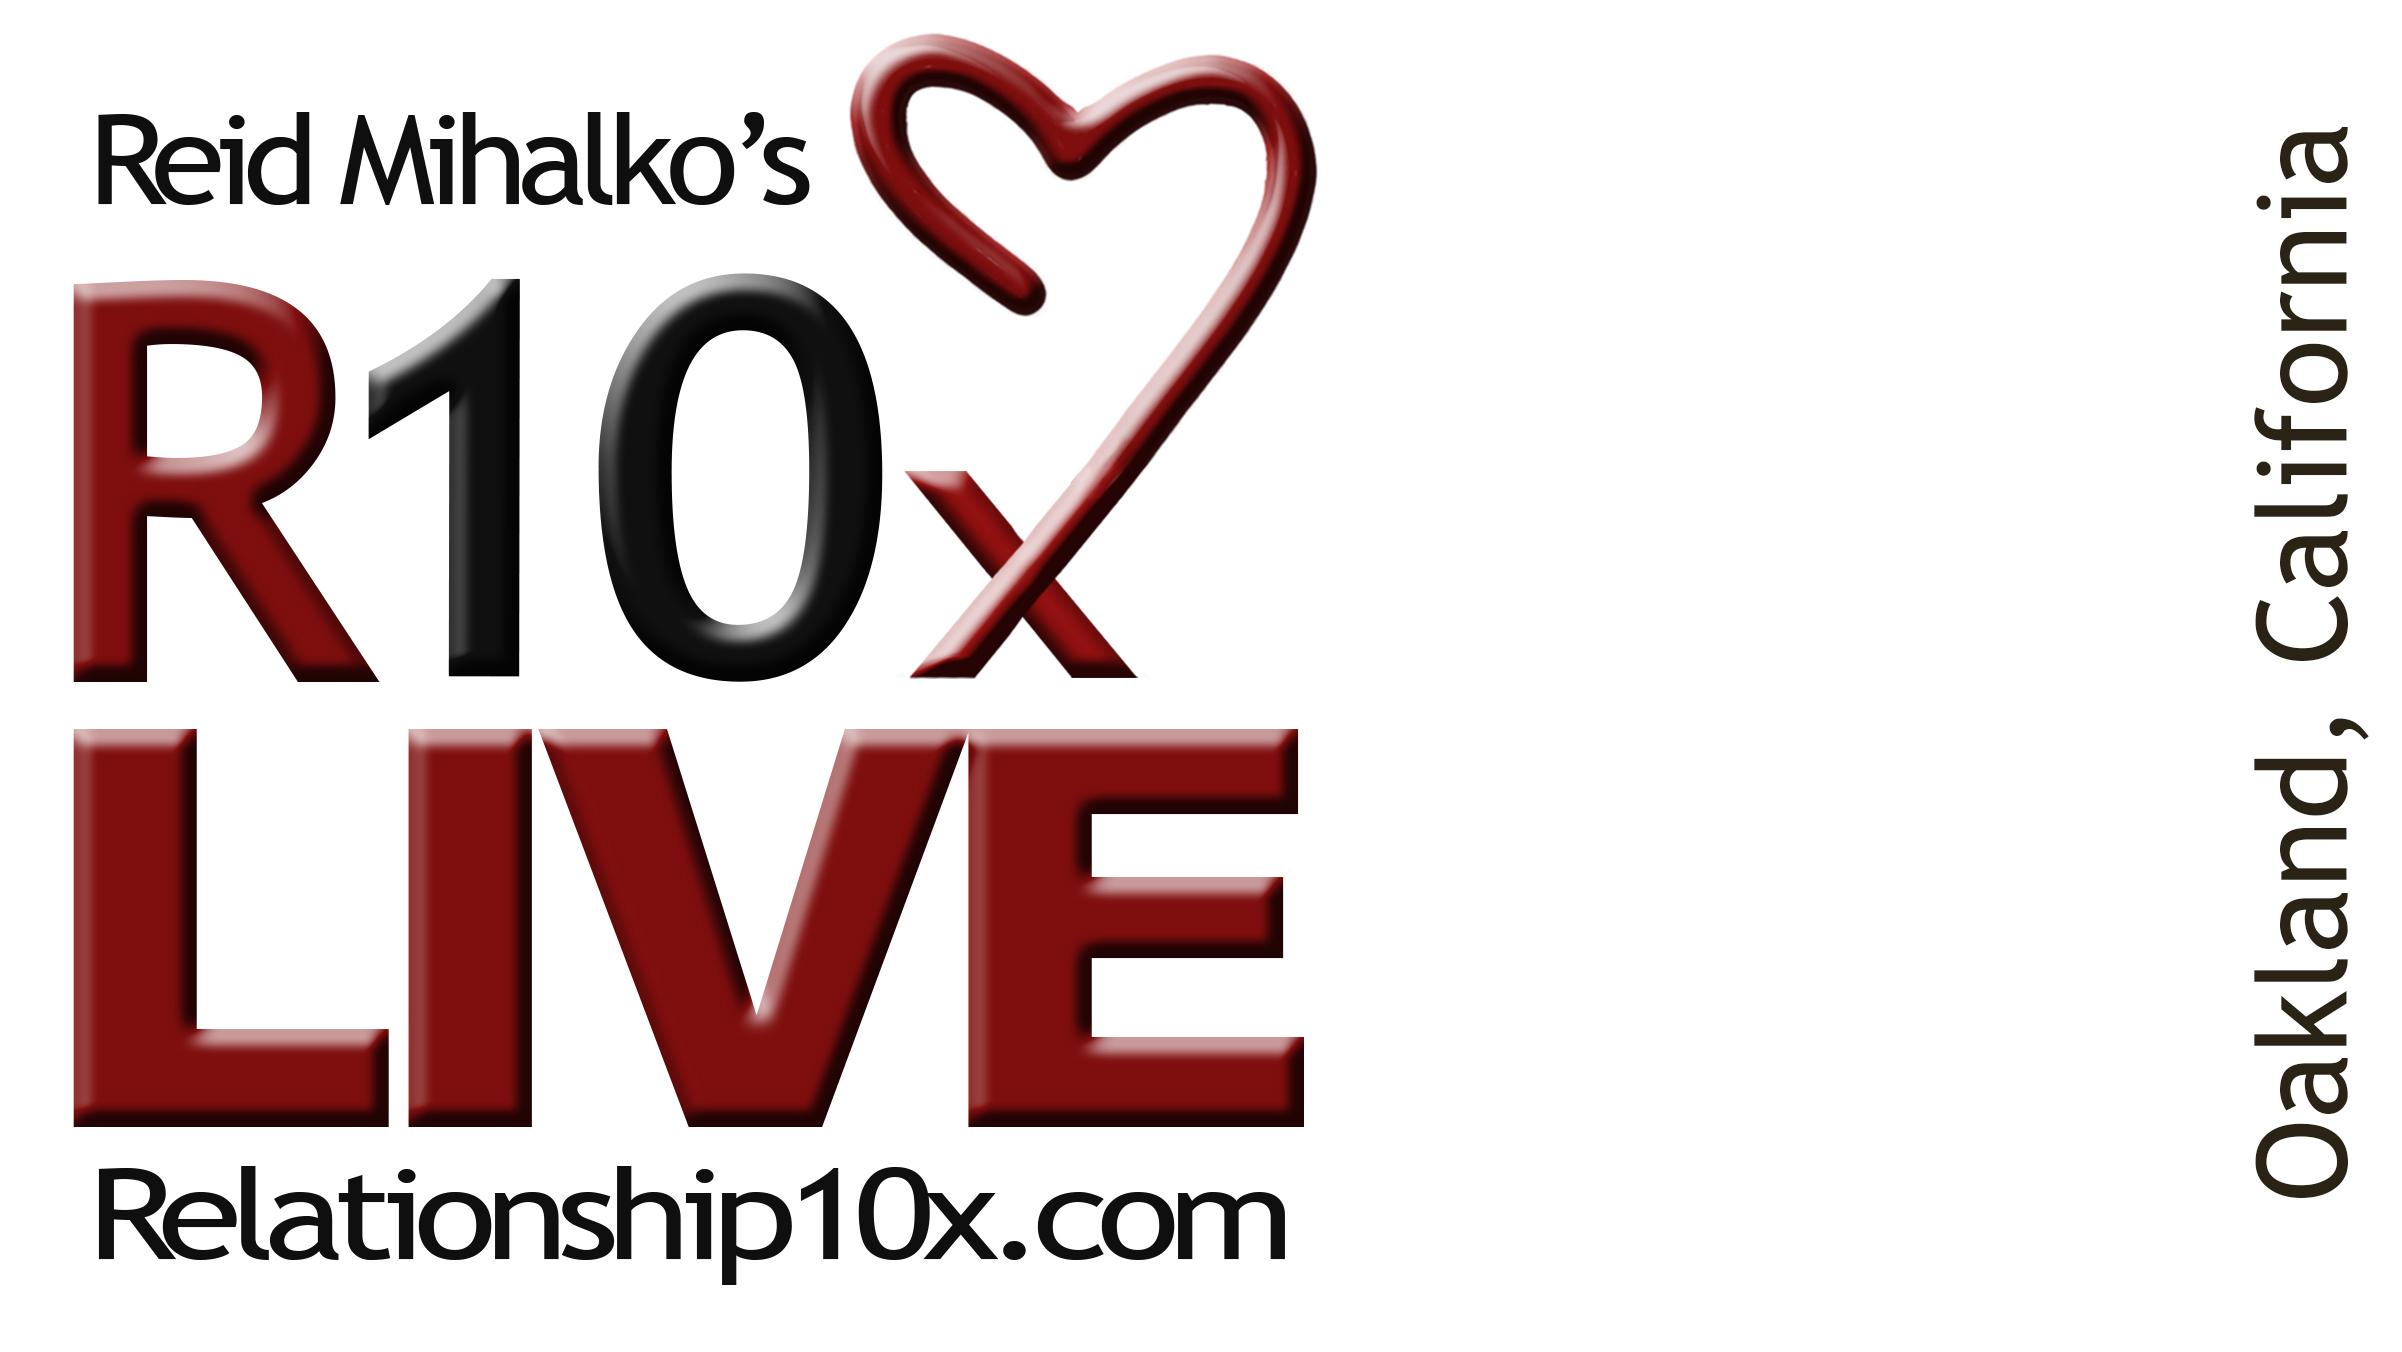 Relationship 10x LIVE 2015 Videos